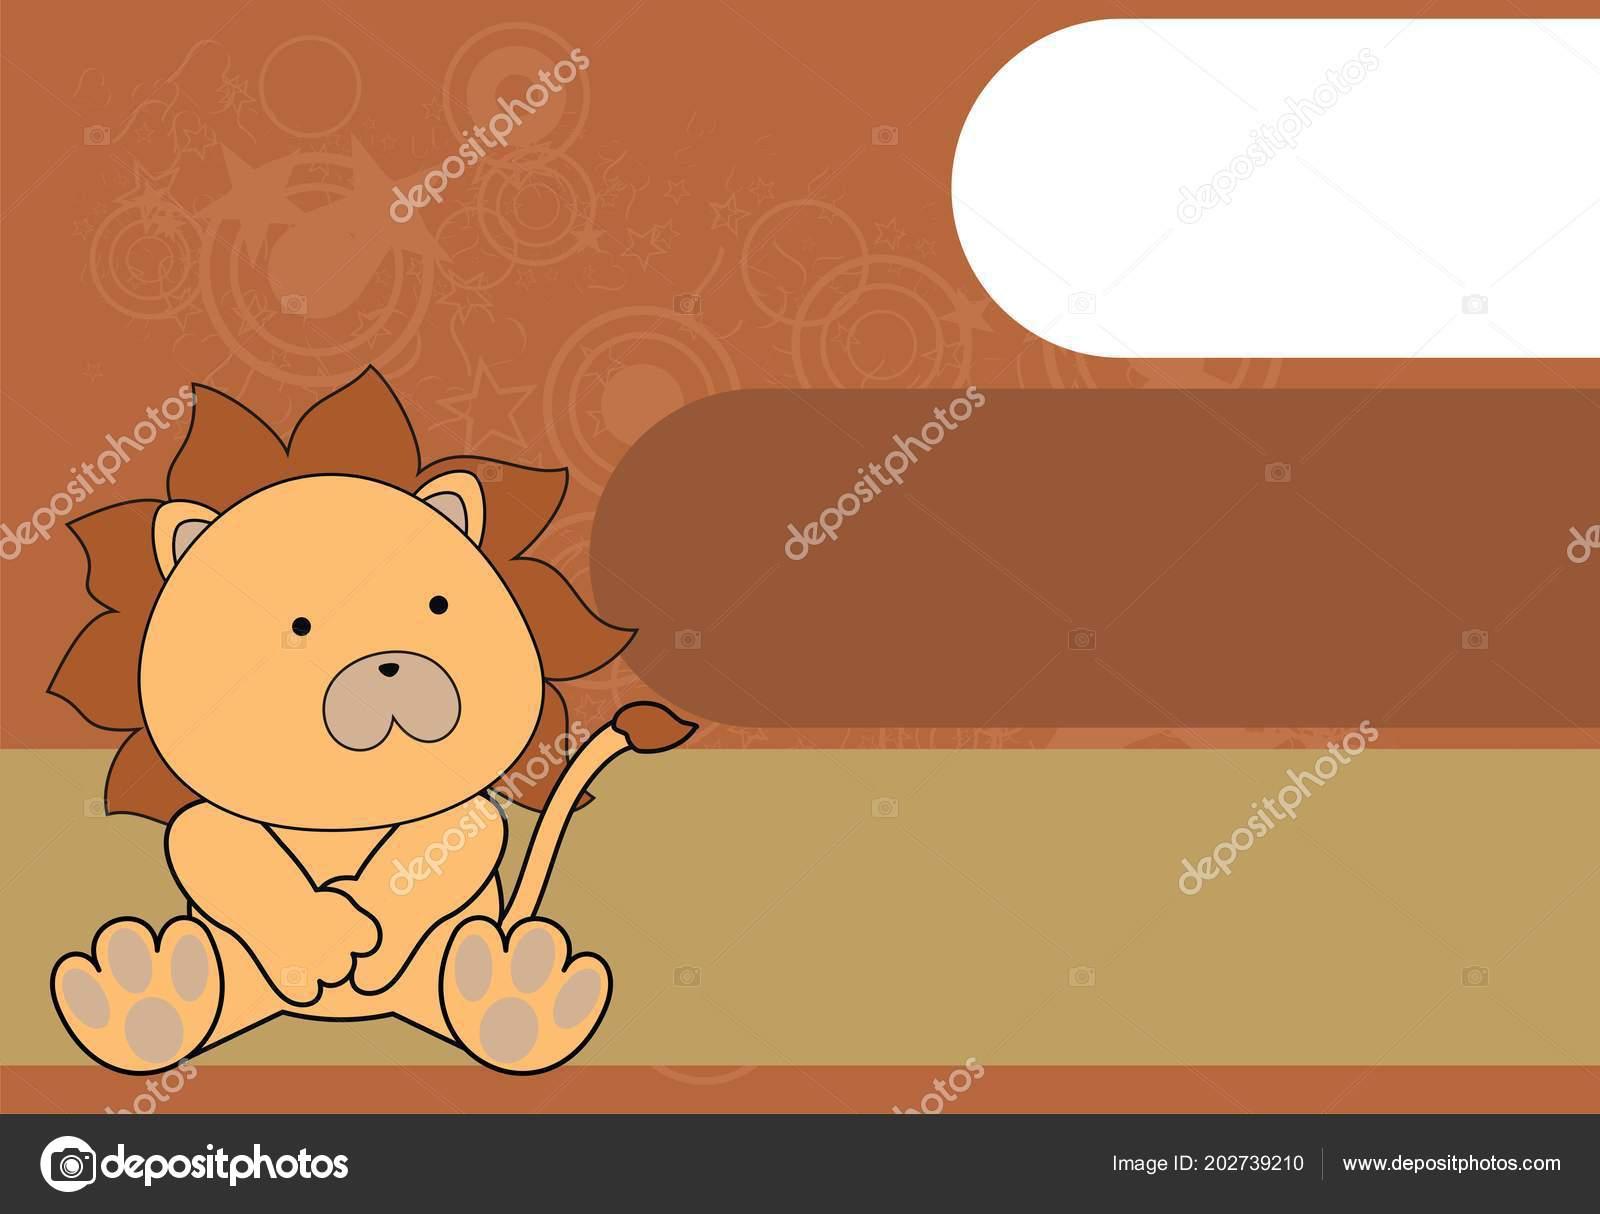 Roztomily Sedici Baby Lev Kreslene Pozadi Vektorovem Formatu Velmi